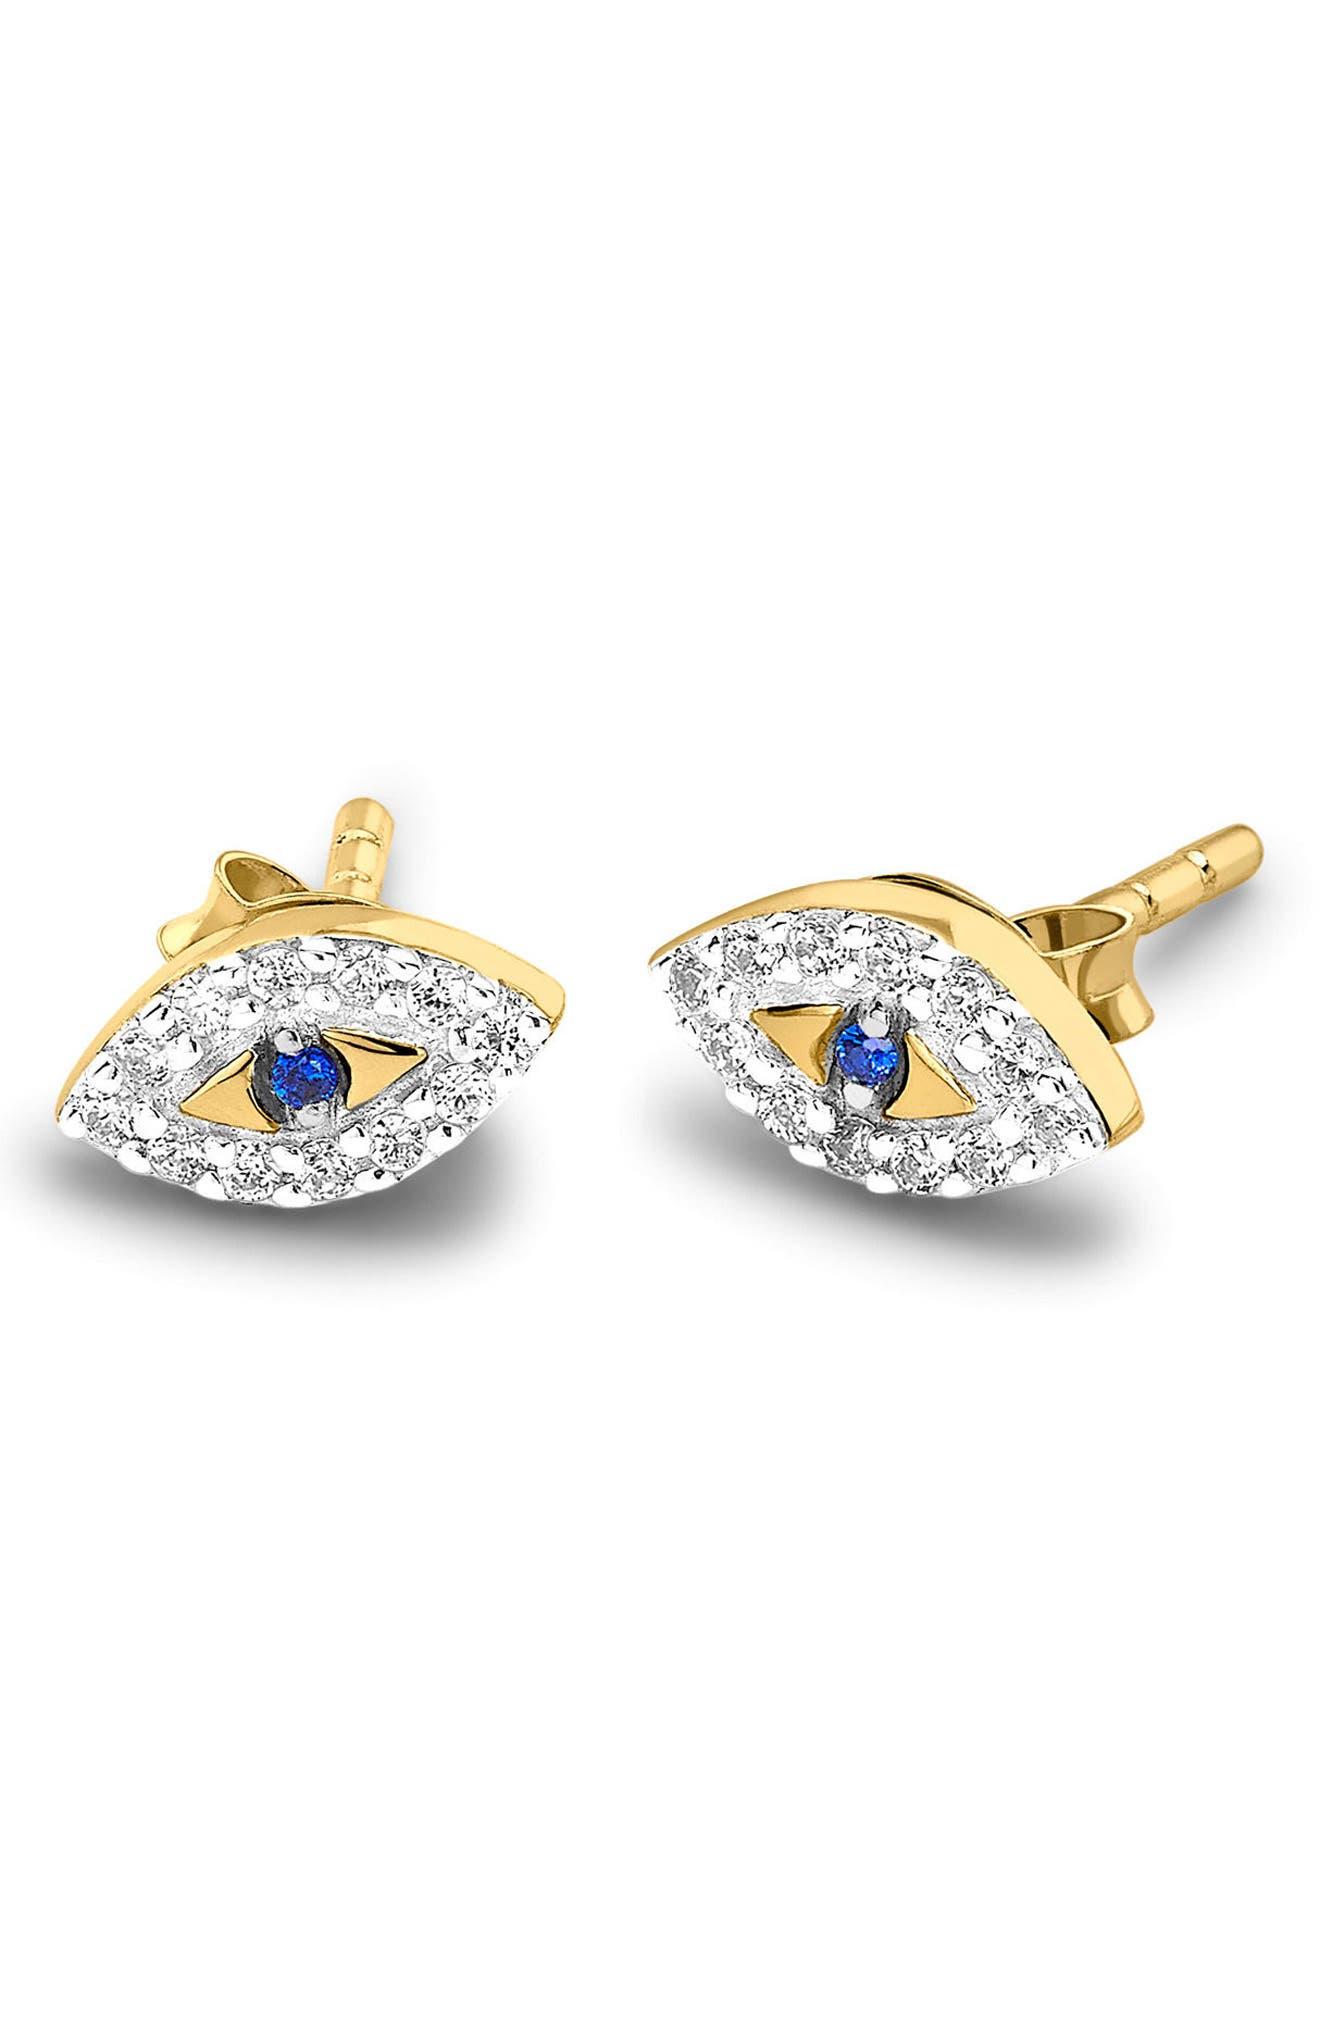 Evil Eye Stud Earrings,                         Main,                         color,